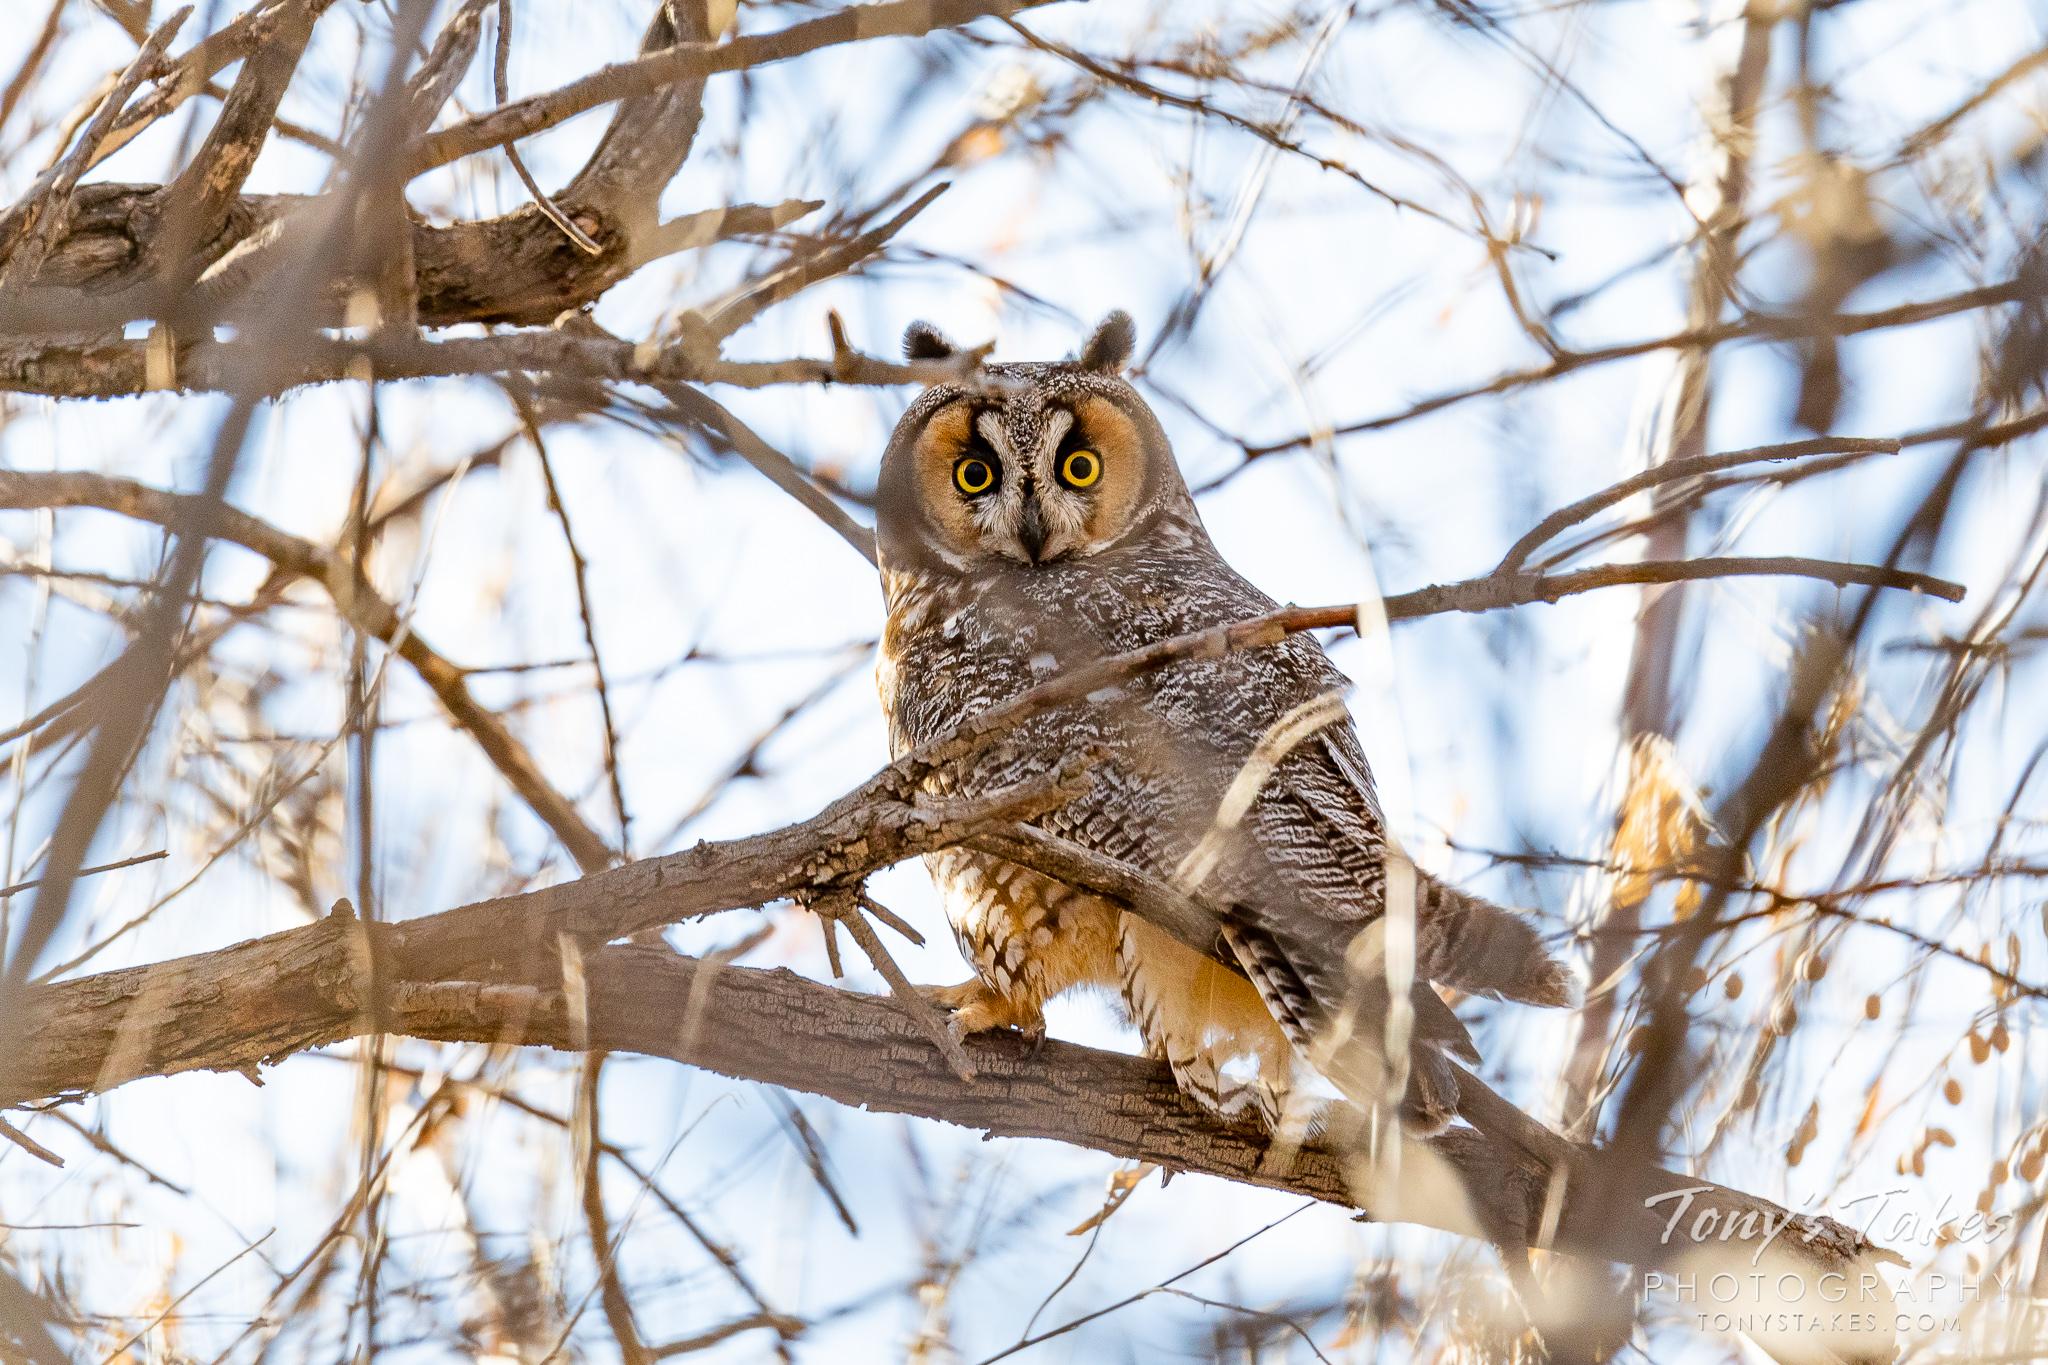 Long-eared owl keeps itself well-buried